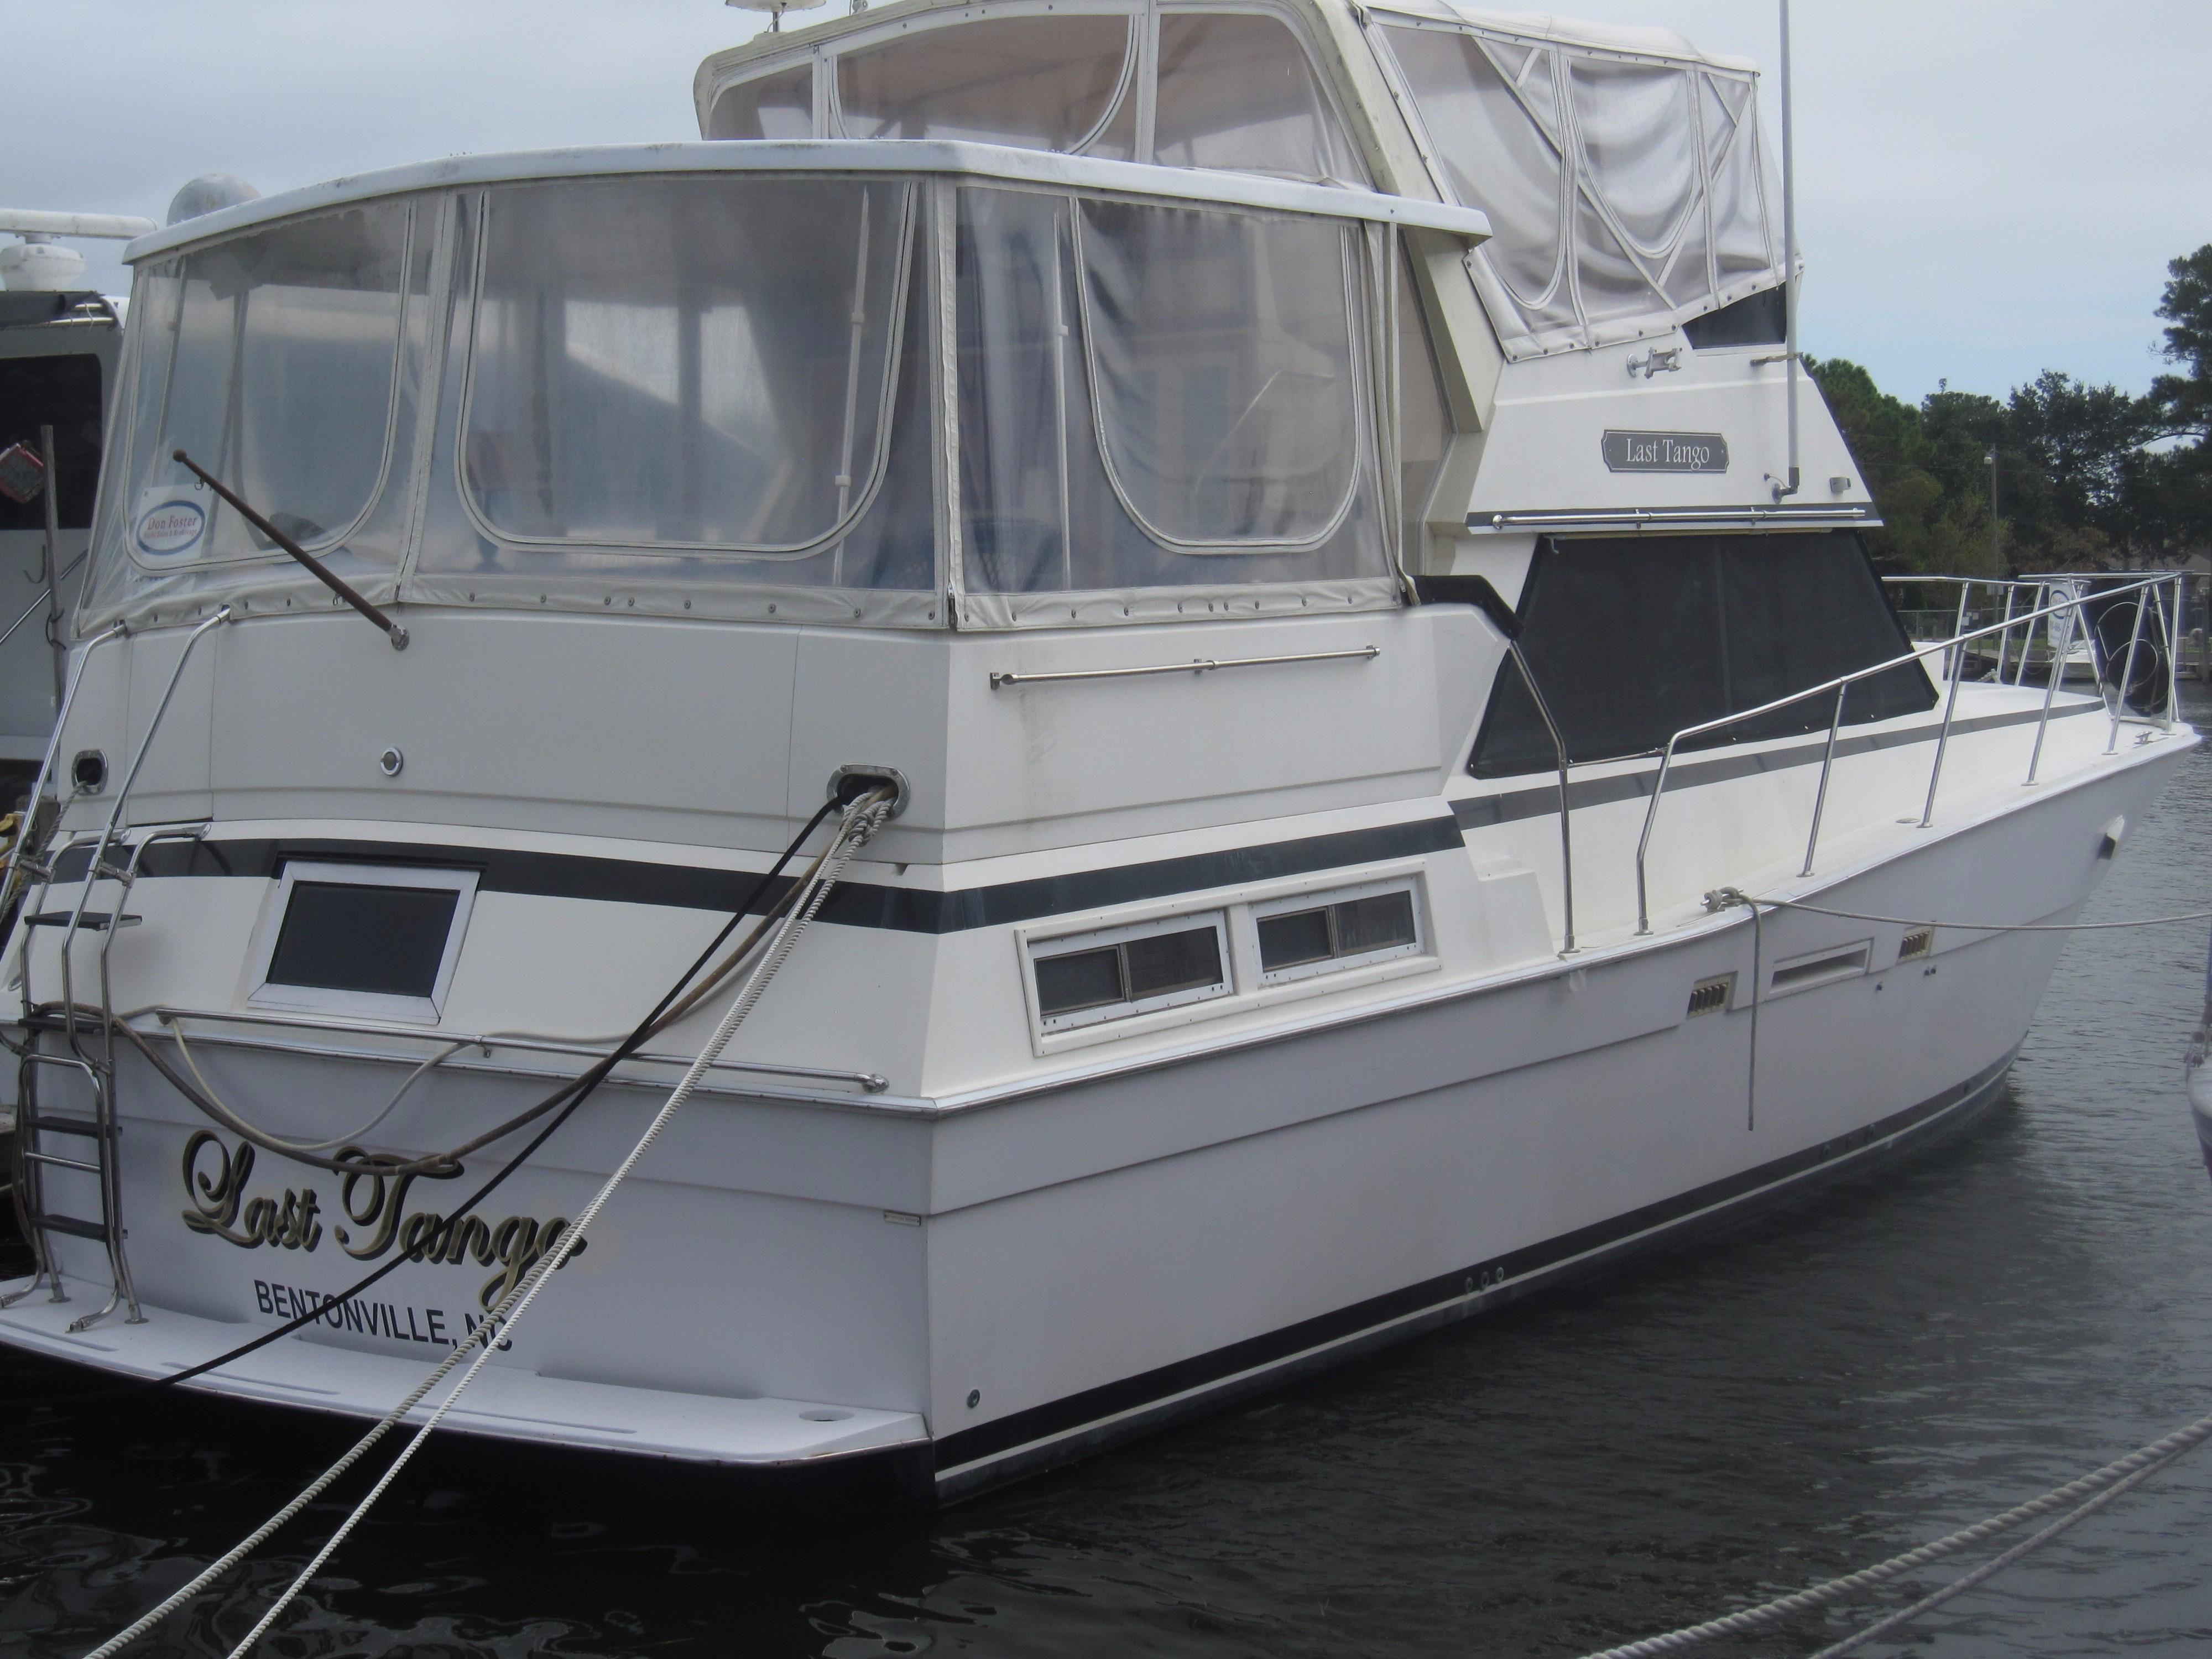 1985 viking motor yacht w cats power boat for sale www for 85 viking motor yacht